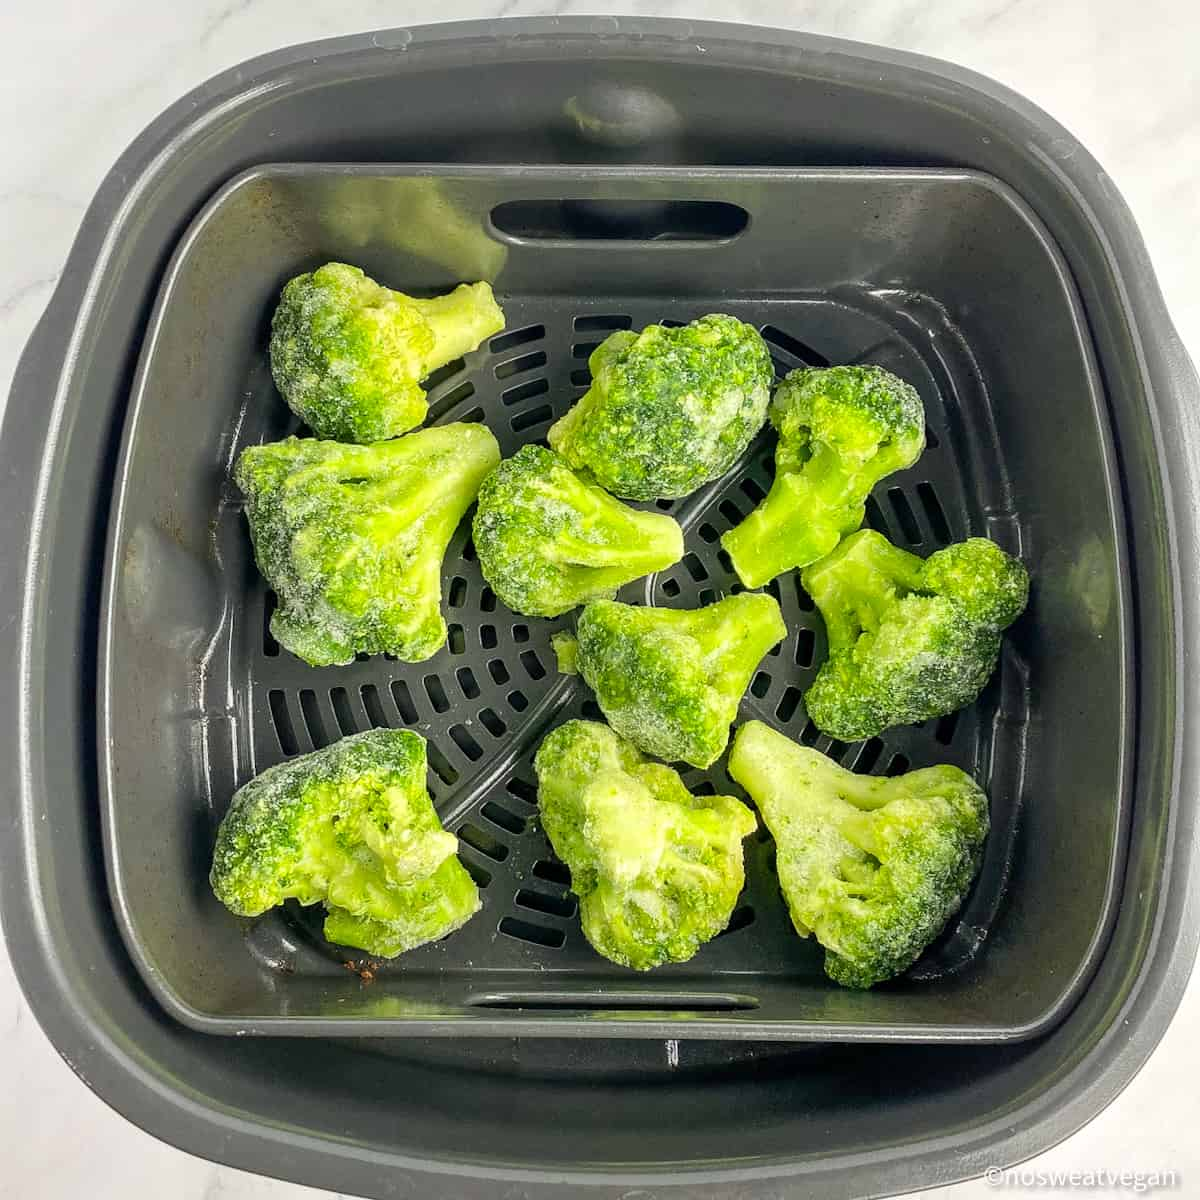 Frozen broccoli in an air fryer basket.